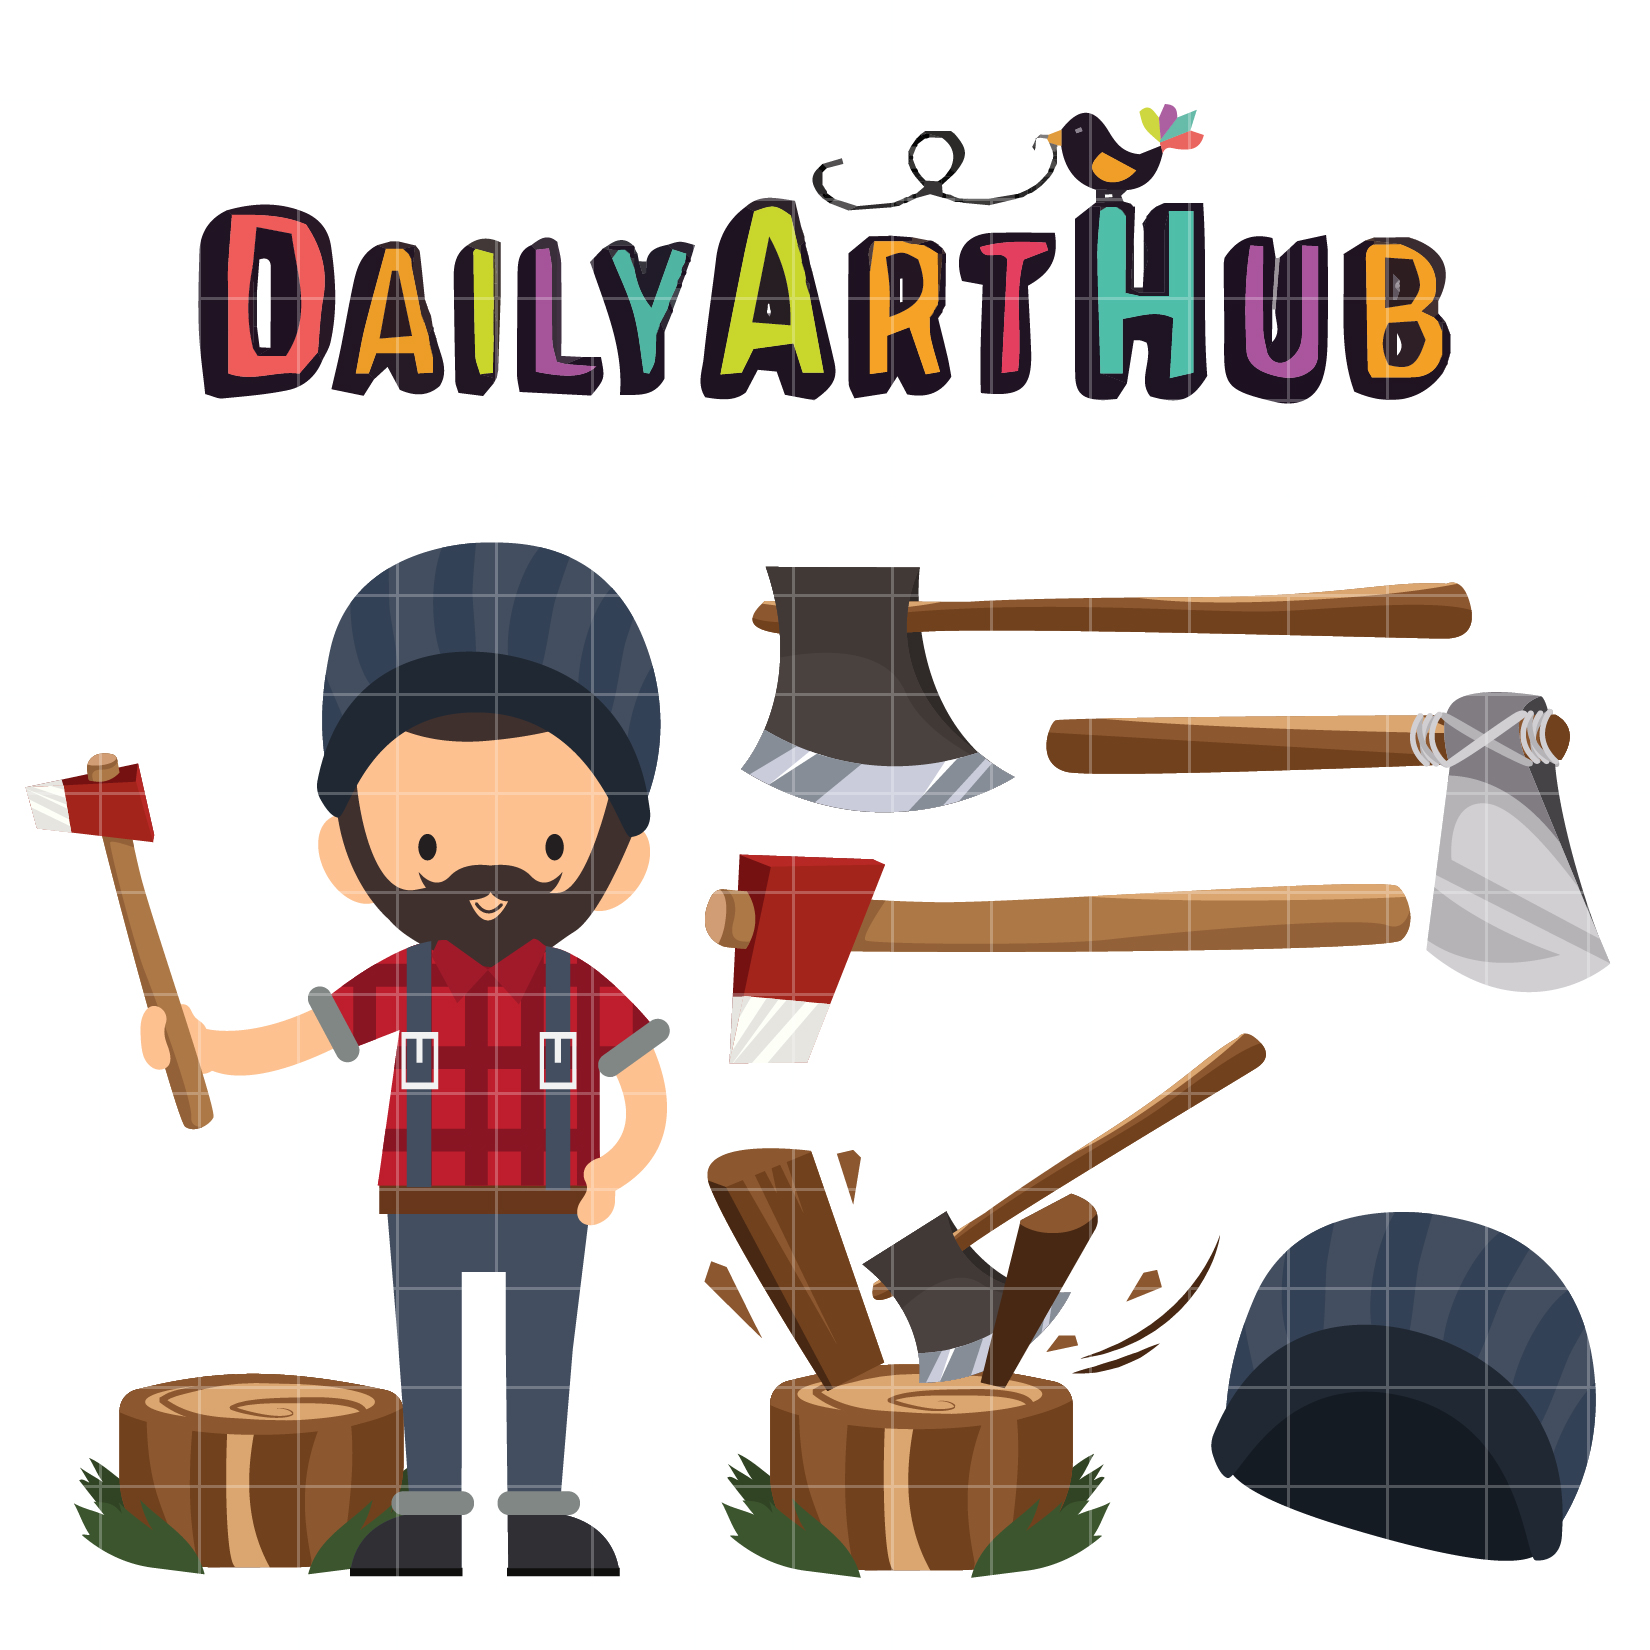 Lumberjack clipart. Clip art set daily